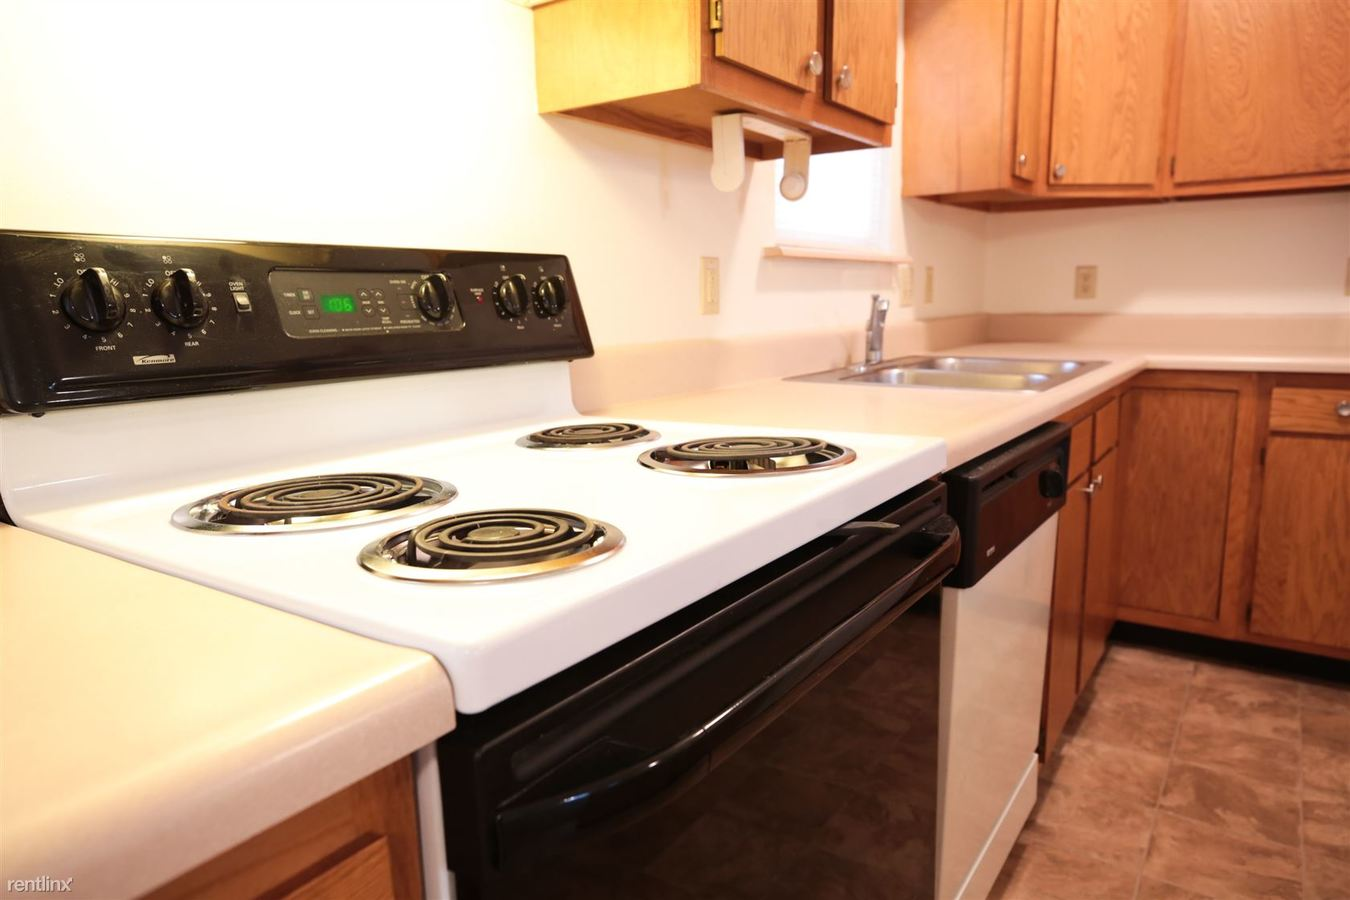 2 Bedrooms 1 Bathroom Apartment for rent at Deer Creek Crossing Villas in Garrett, IN